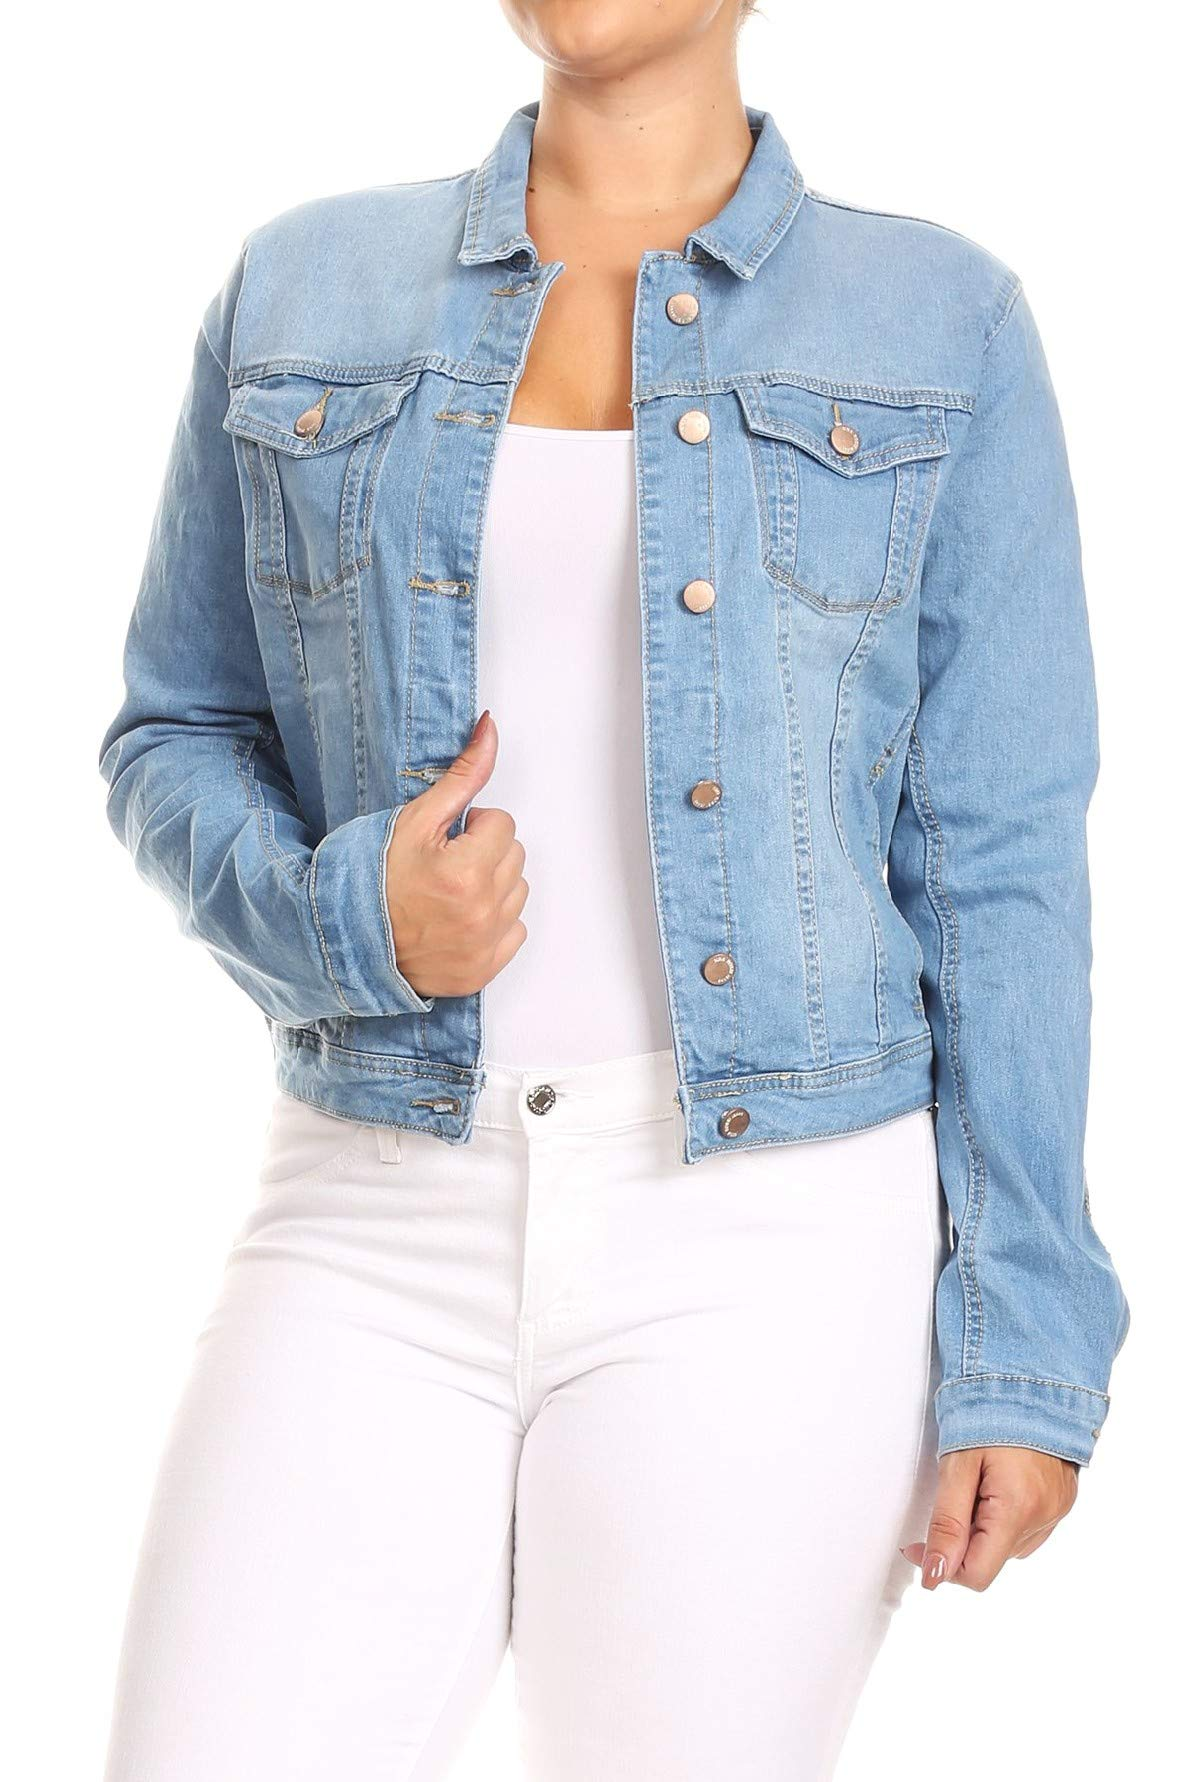 Fashion2Love Women's Junior Plus Size, Premium Denim Jackets Long Sleeve Loose Jean Coats in Light Blue Size 3XL